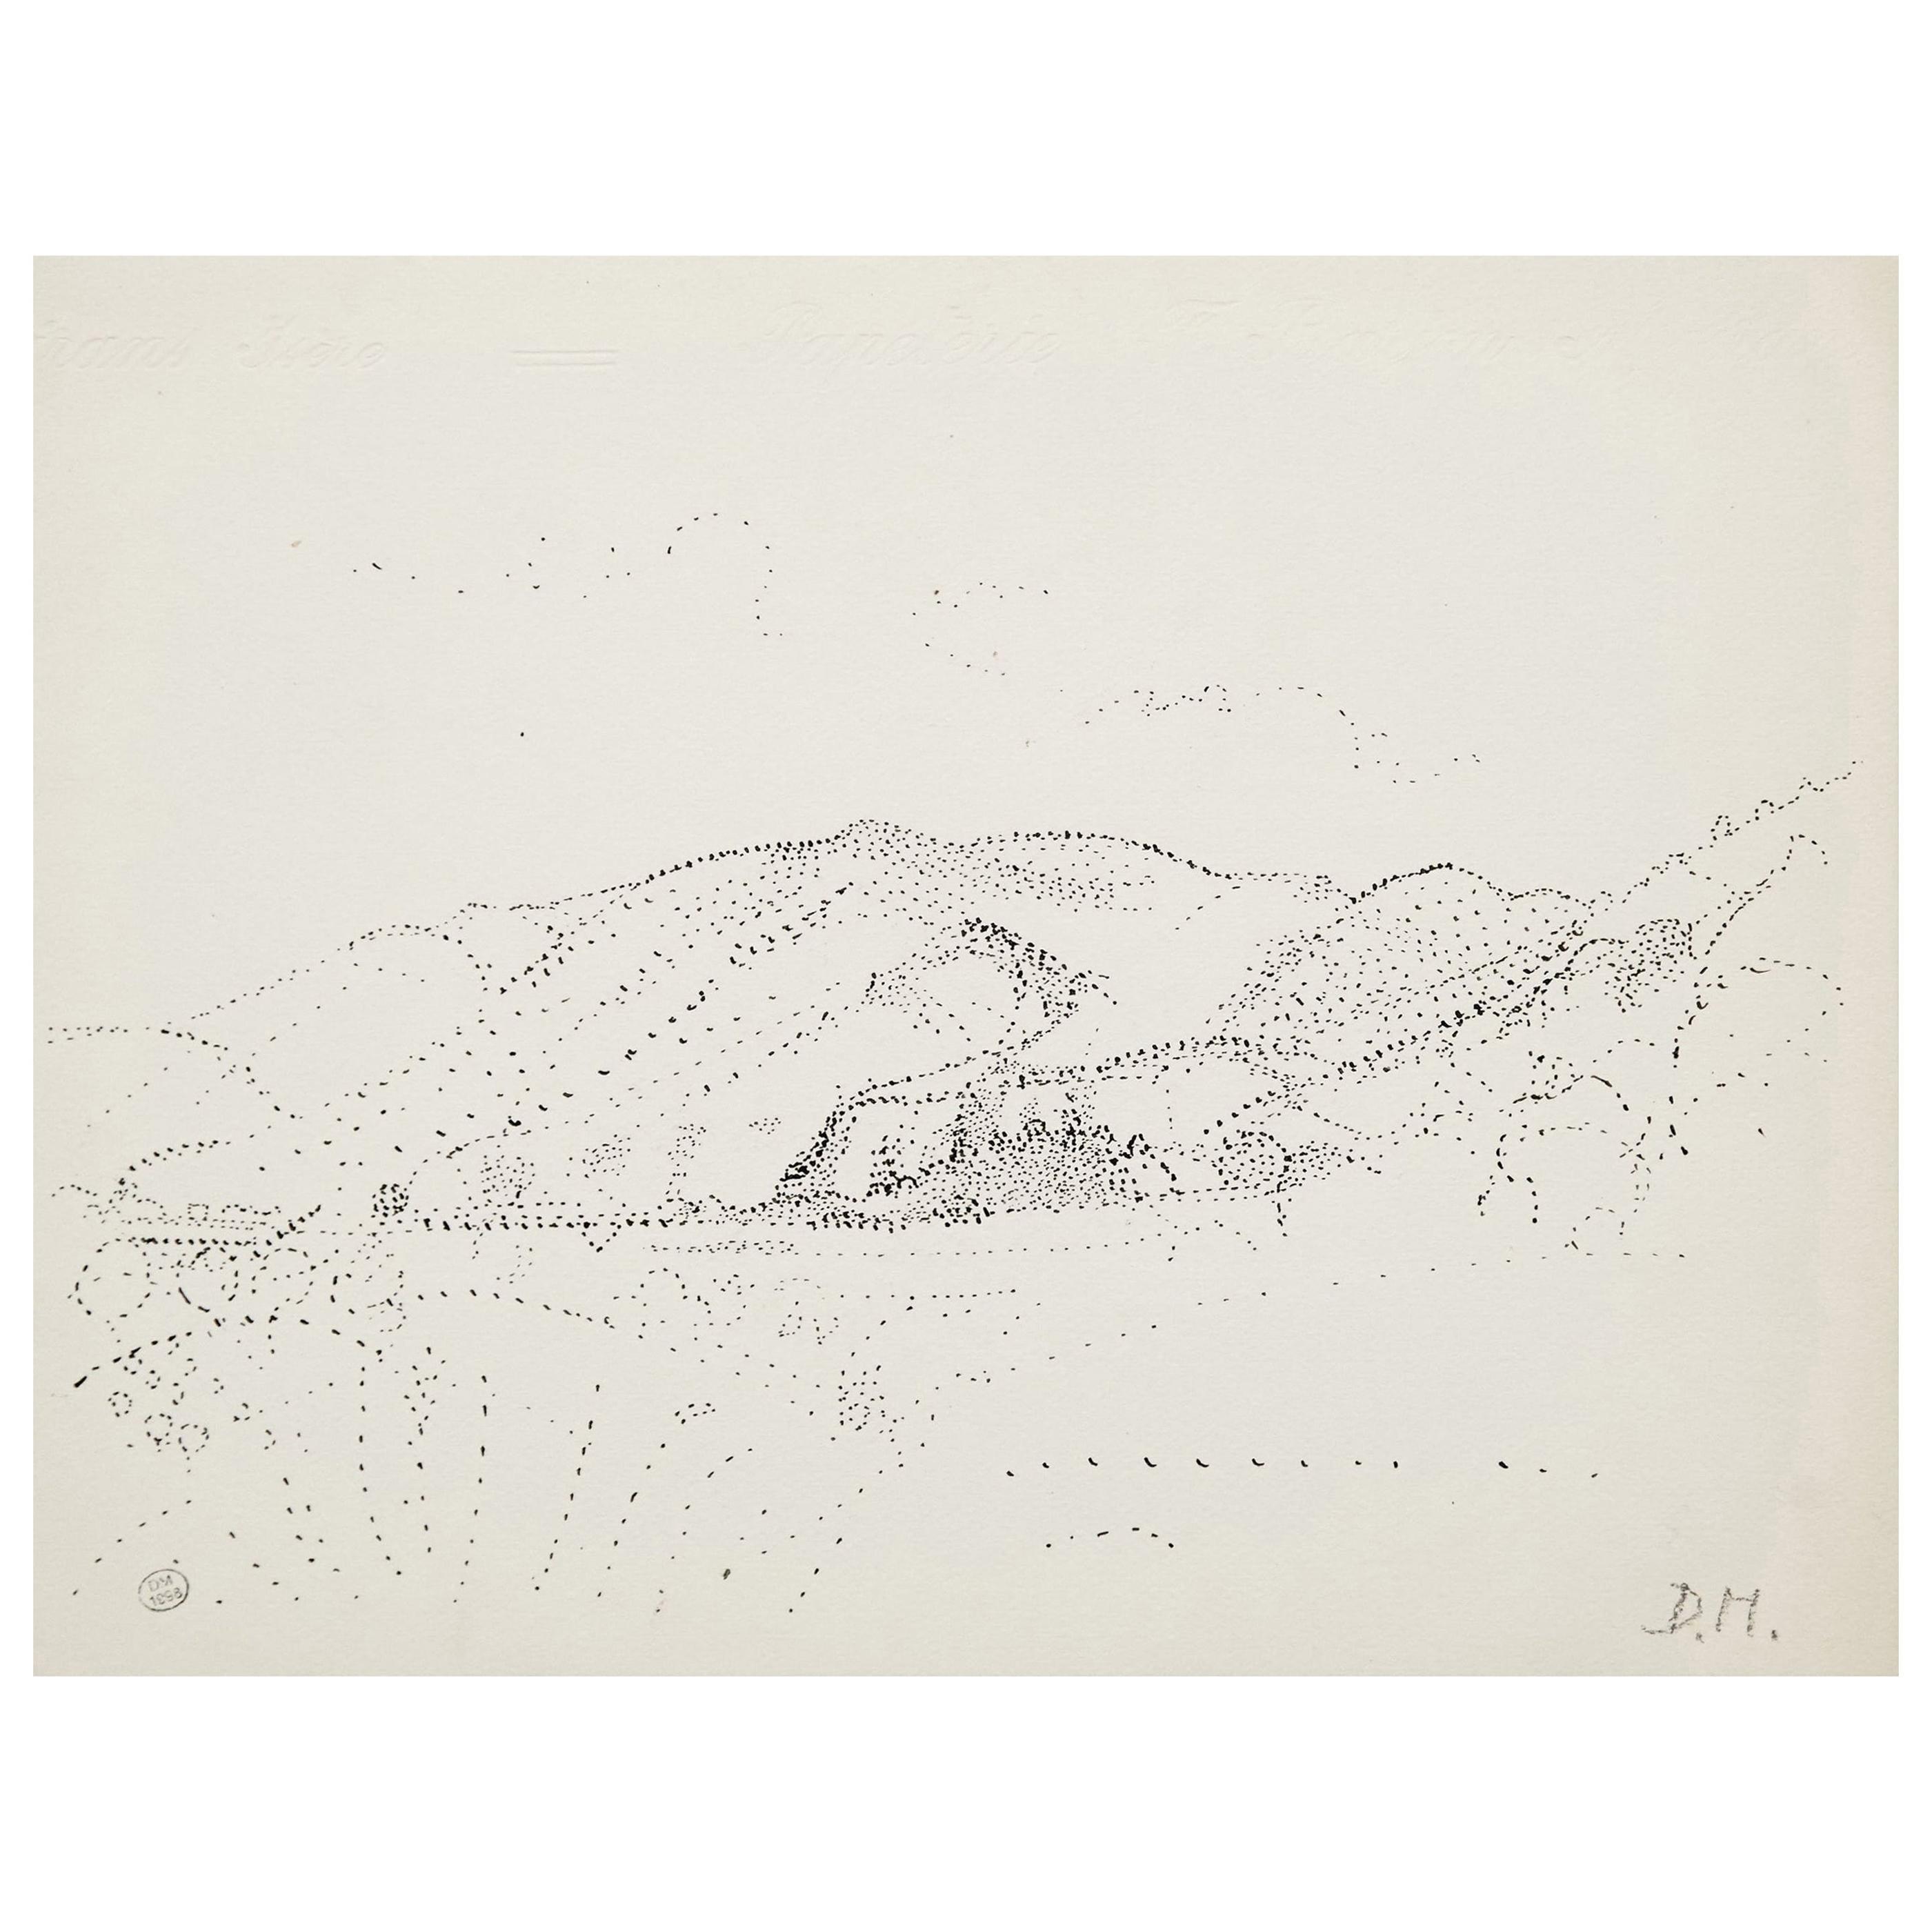 Dora Maar Pointillist Surrealist Landscape Drawing